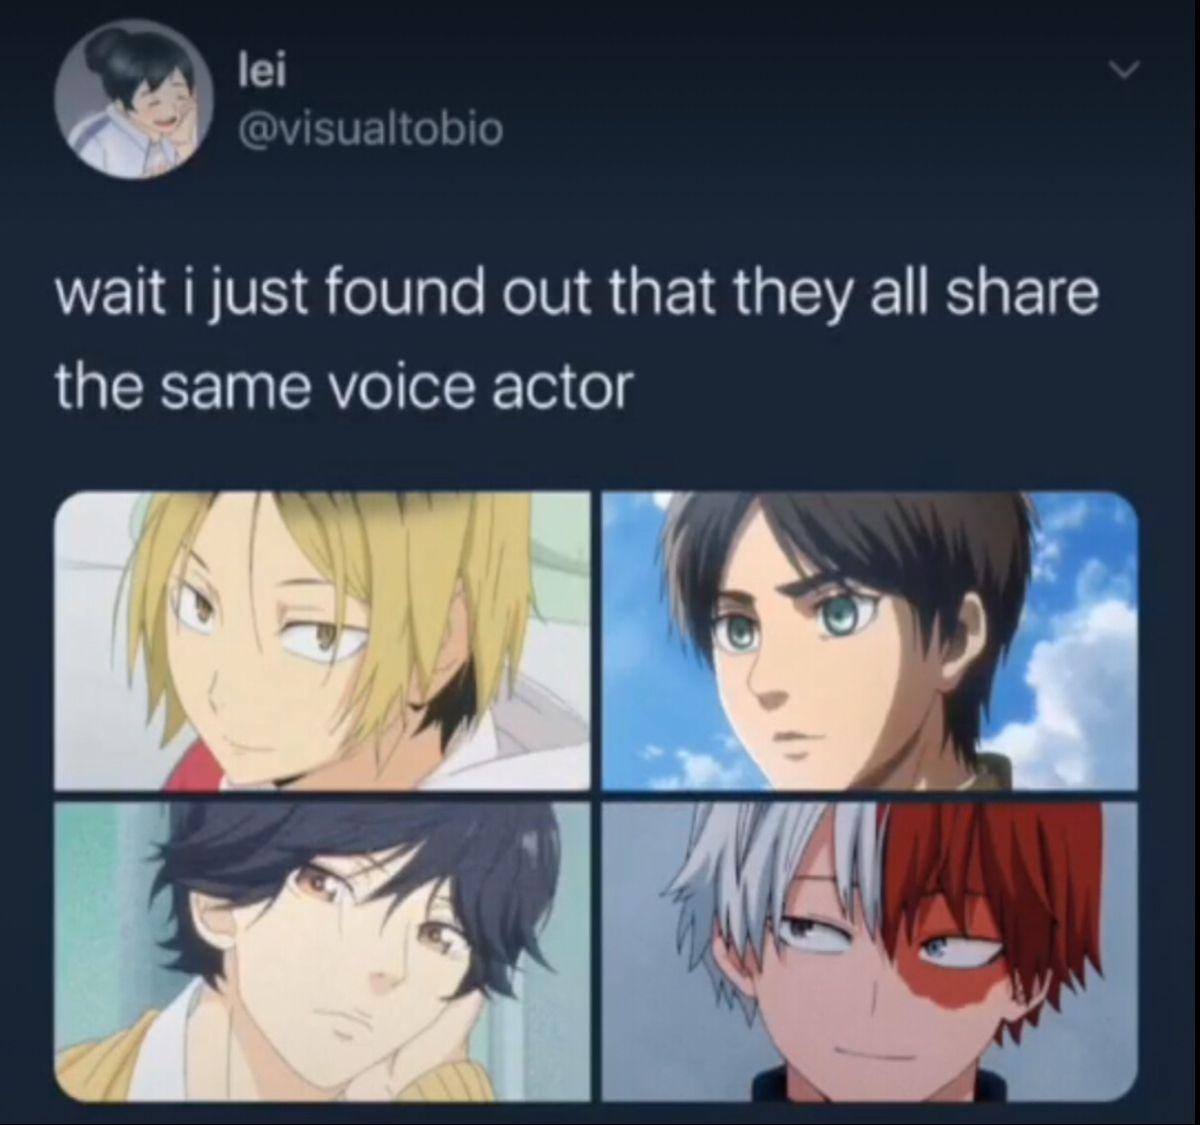 My Eyes Are Busy Anime Funny Cute Anime Guys Haikyuu Voice Actors